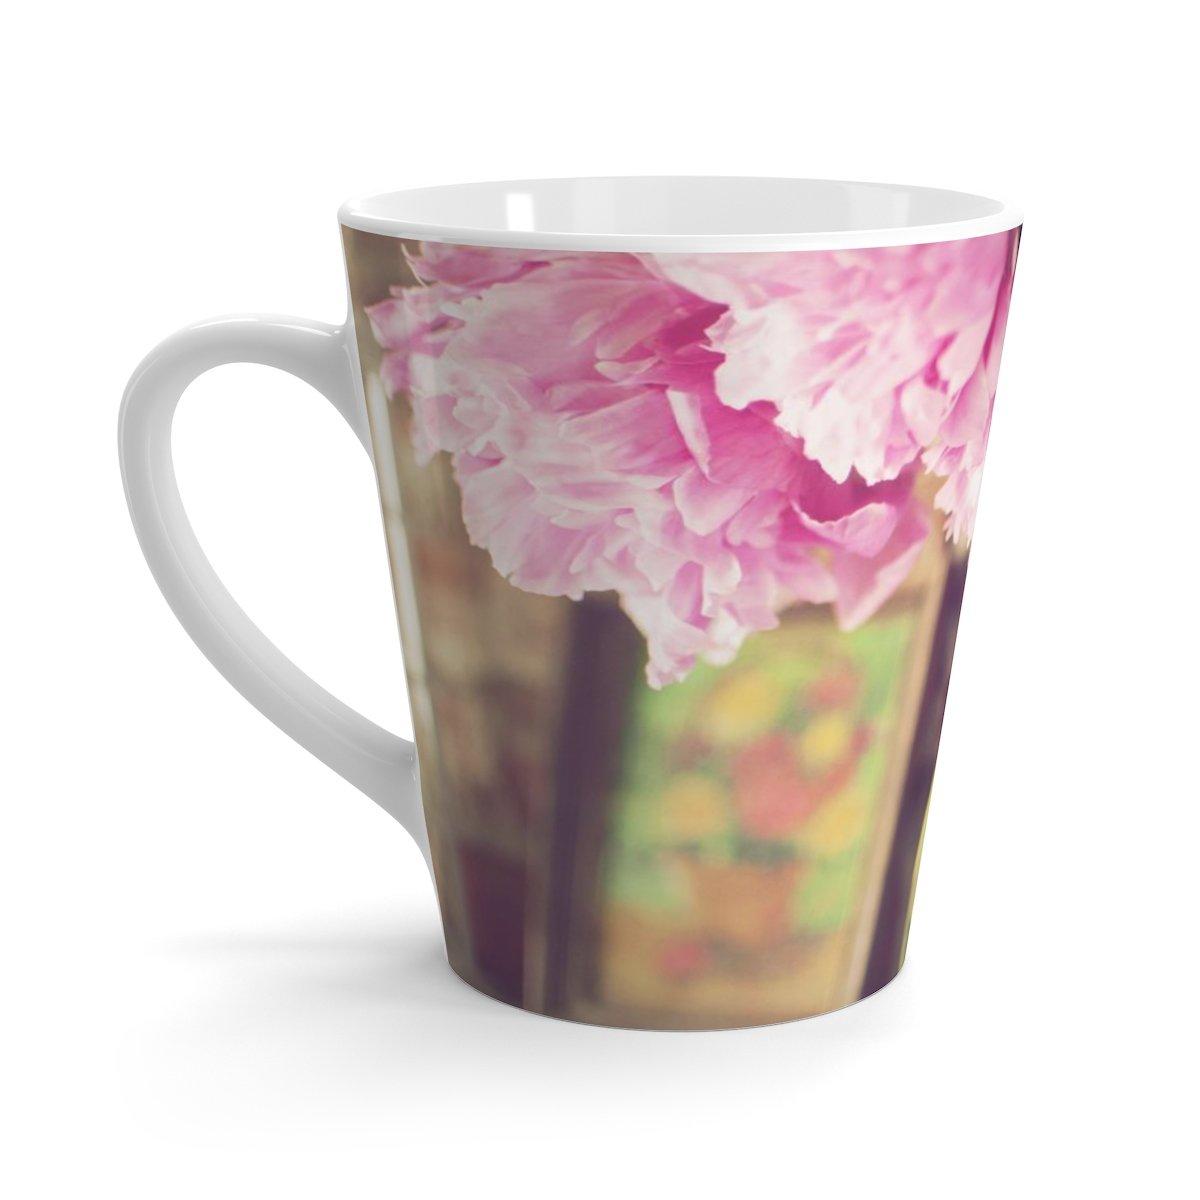 pink peony photo latte mug nature photo gift